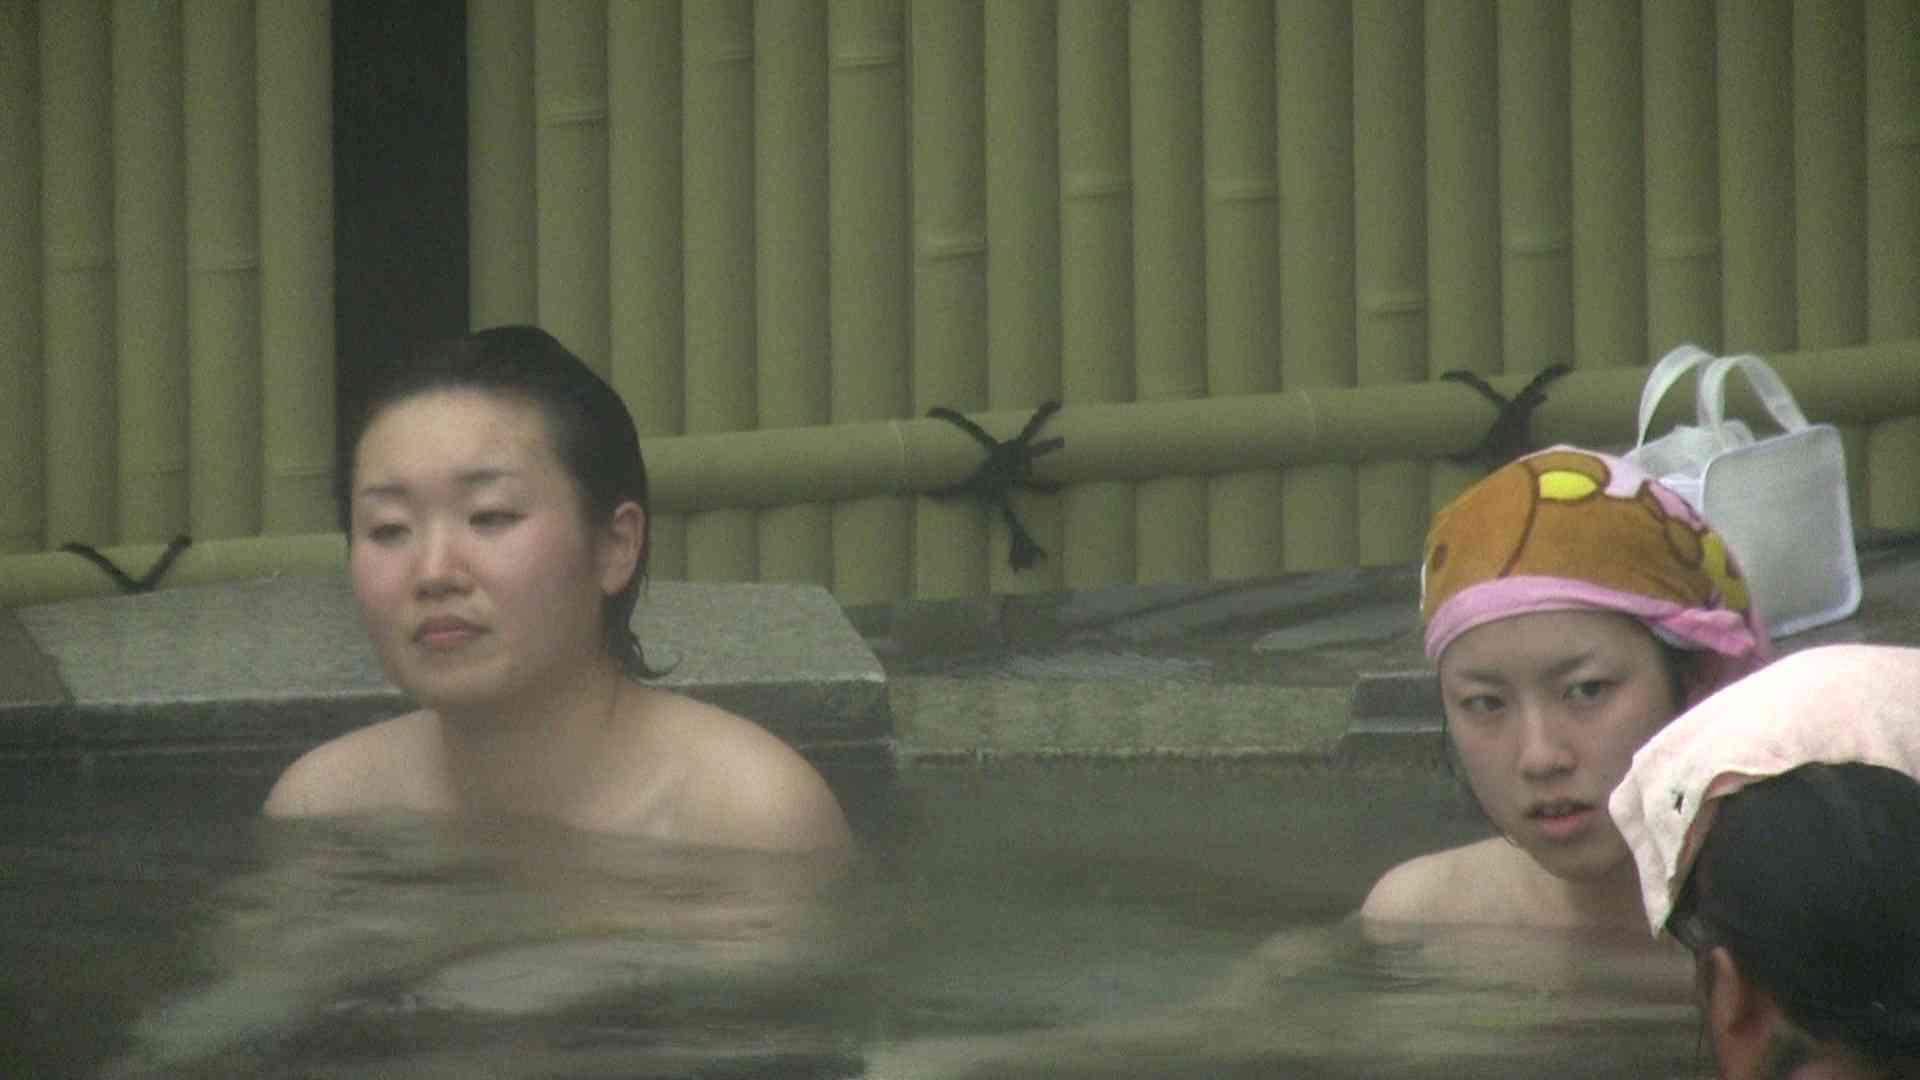 Aquaな露天風呂Vol.171 OLエロ画像 盗撮戯れ無修正画像 108PICs 59